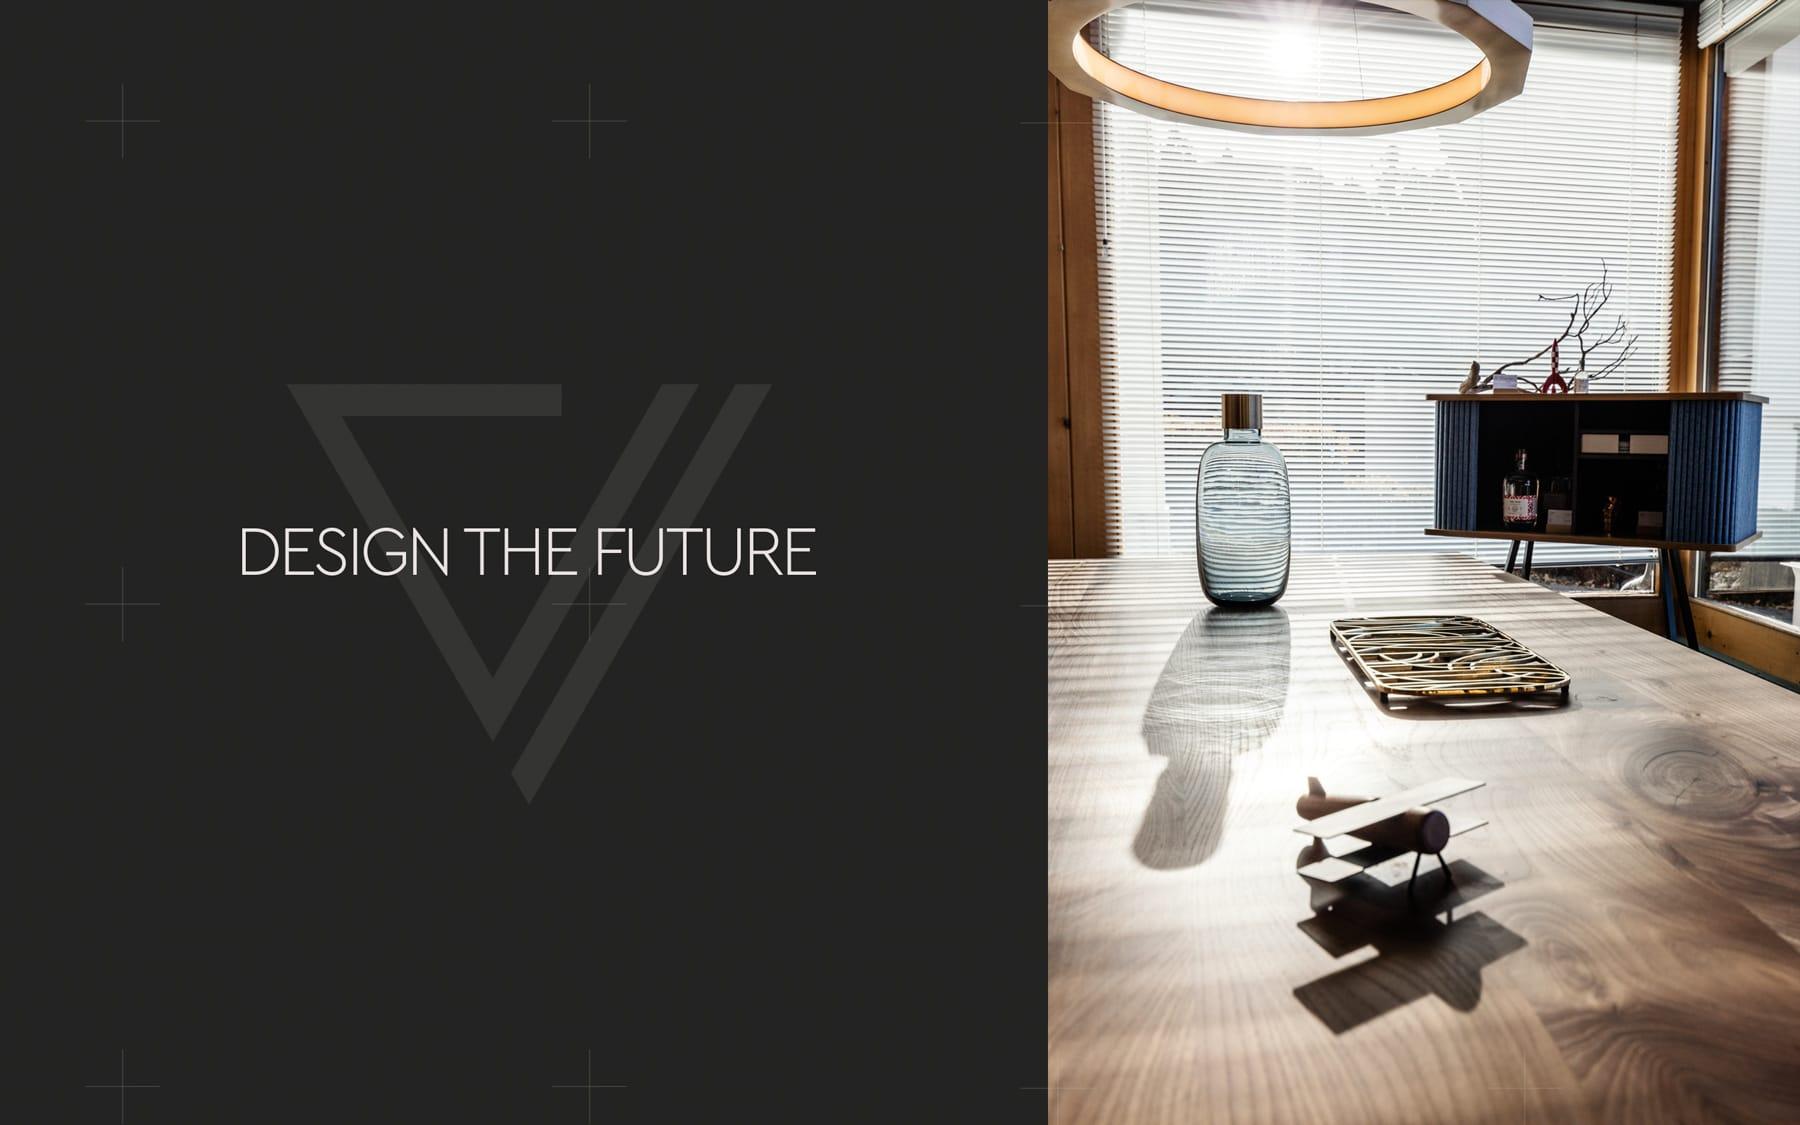 Showroom_Design_the_Future.jpg